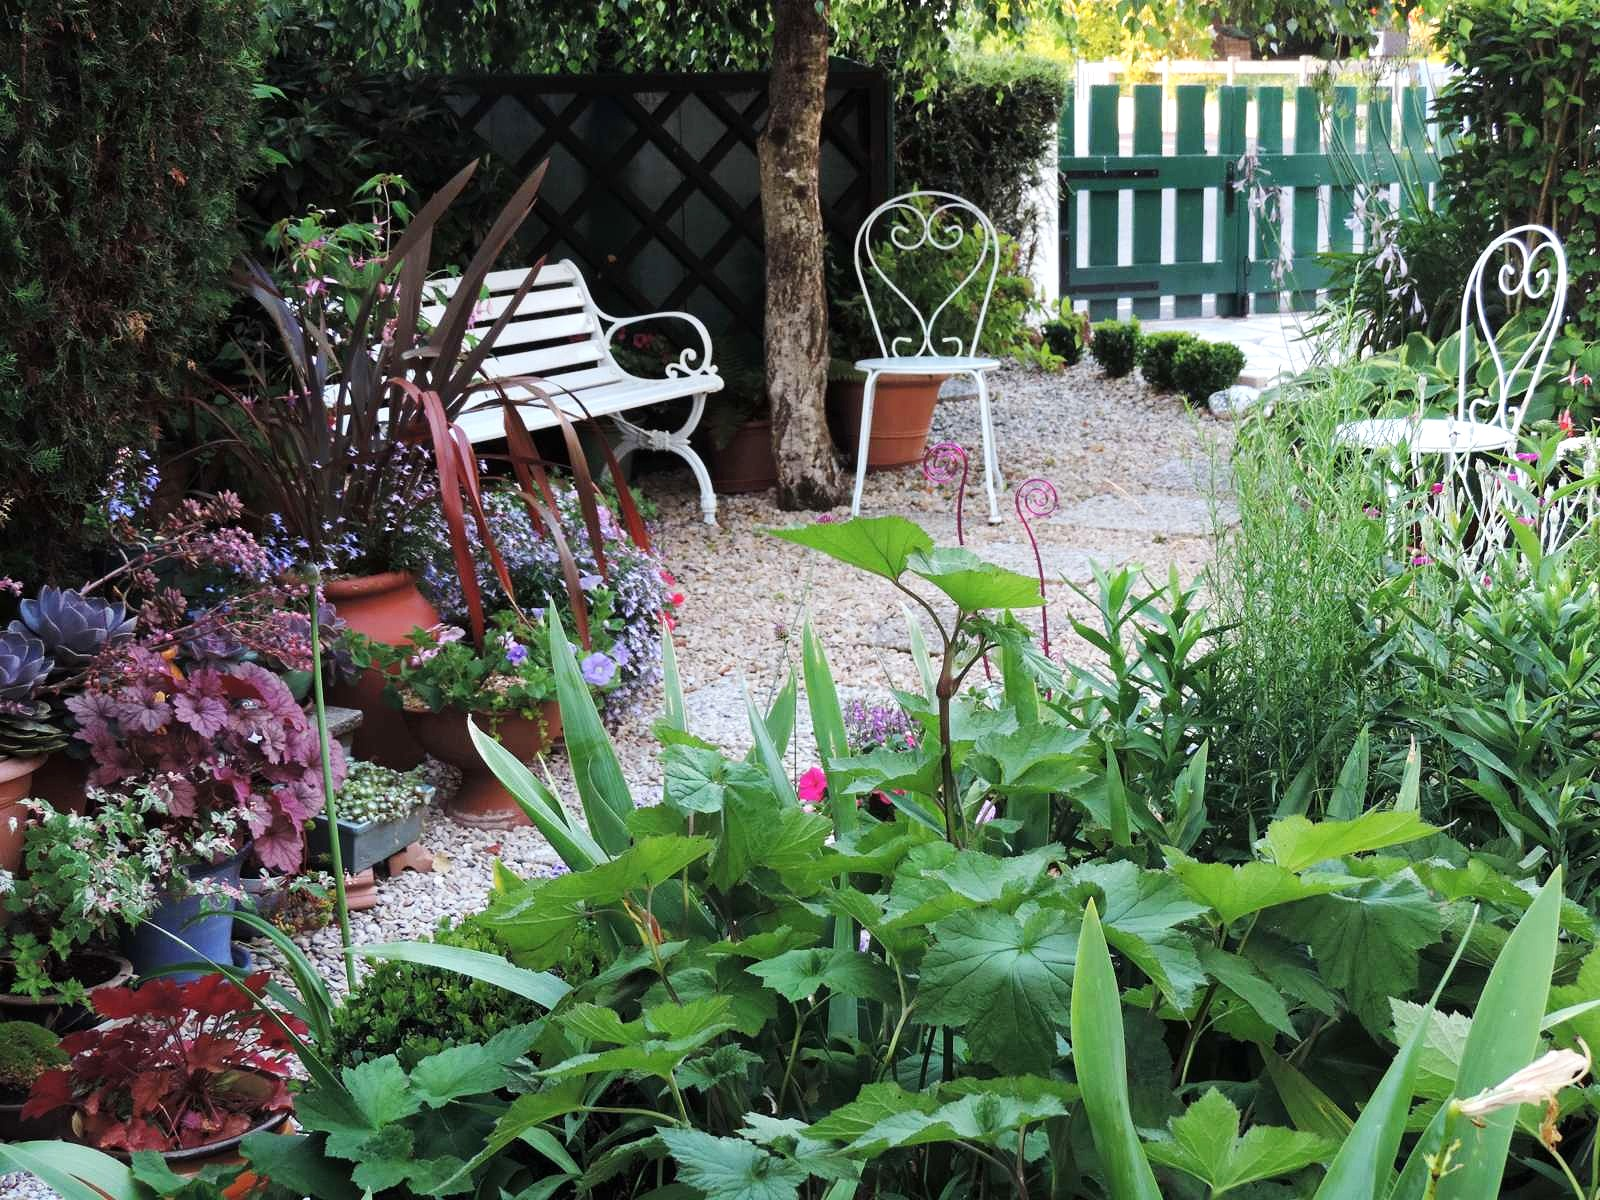 Rétrospective au jardin : Août 2013